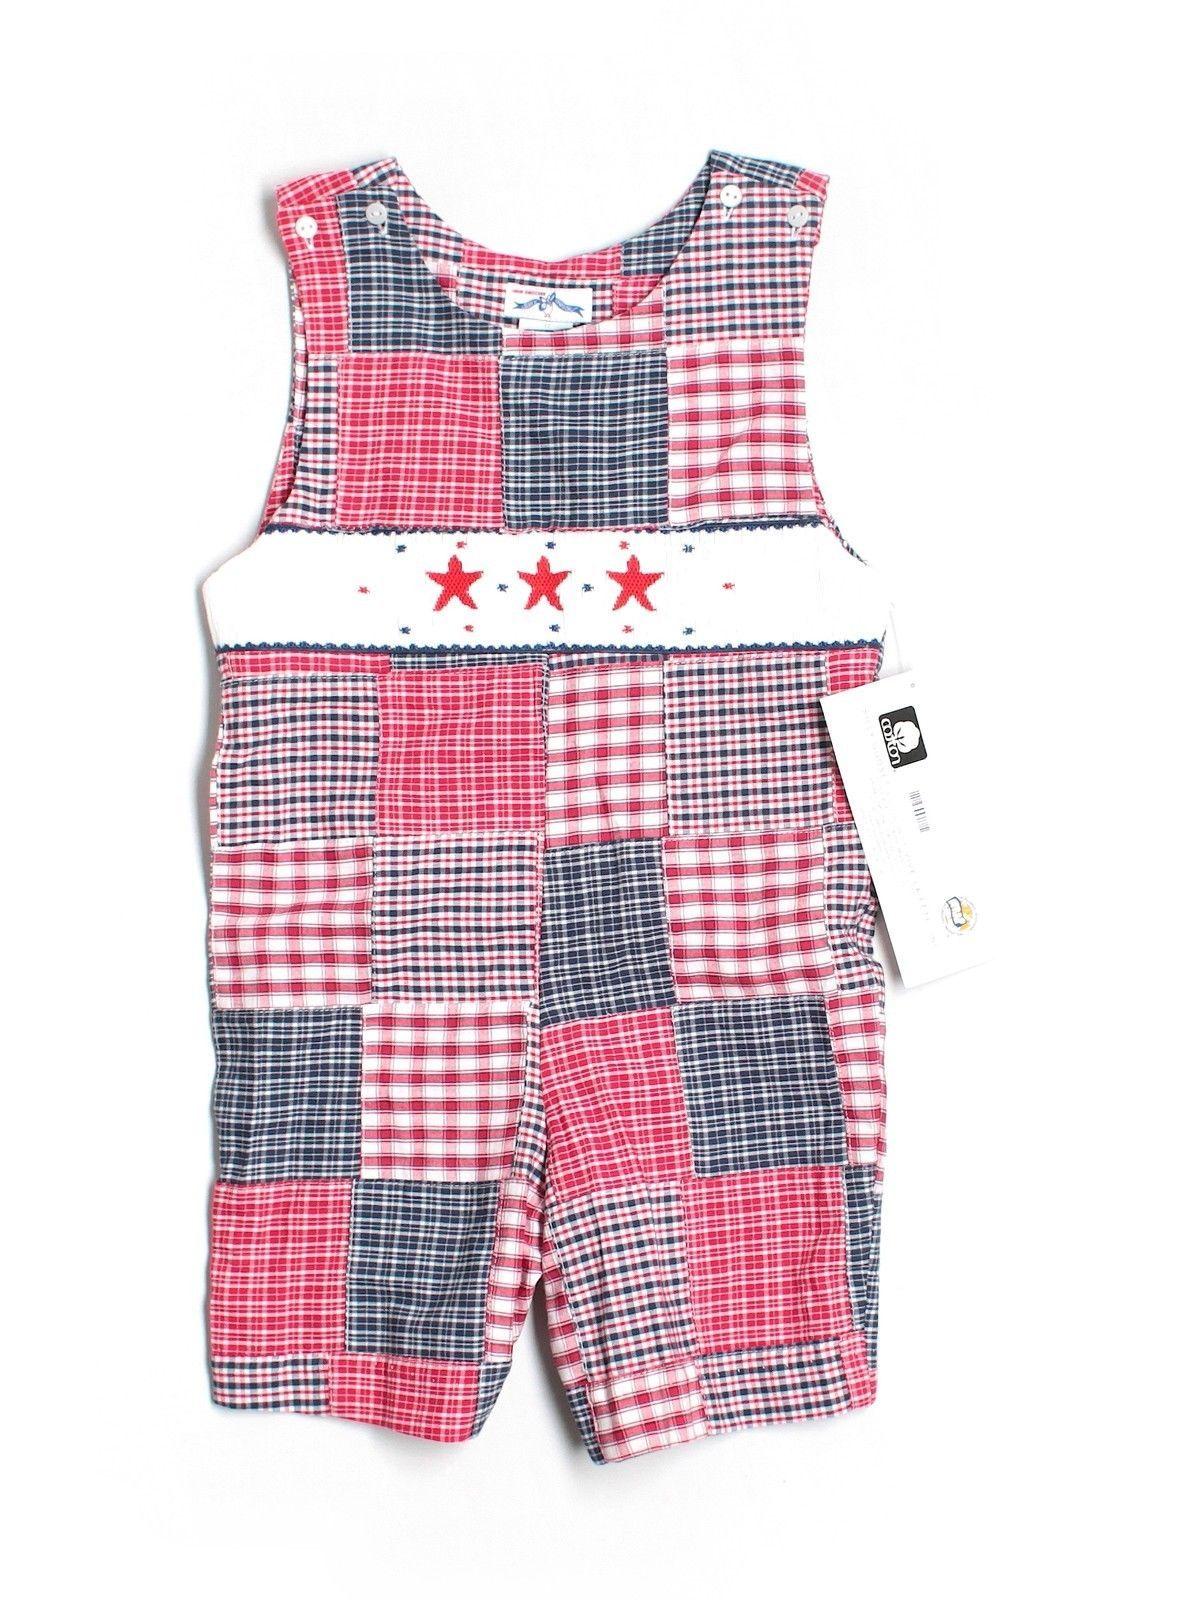 ccb7870c606 New Toddler Boy Silly GOOSE Patriotic Smocked Stars Romper Jon John Size 4T